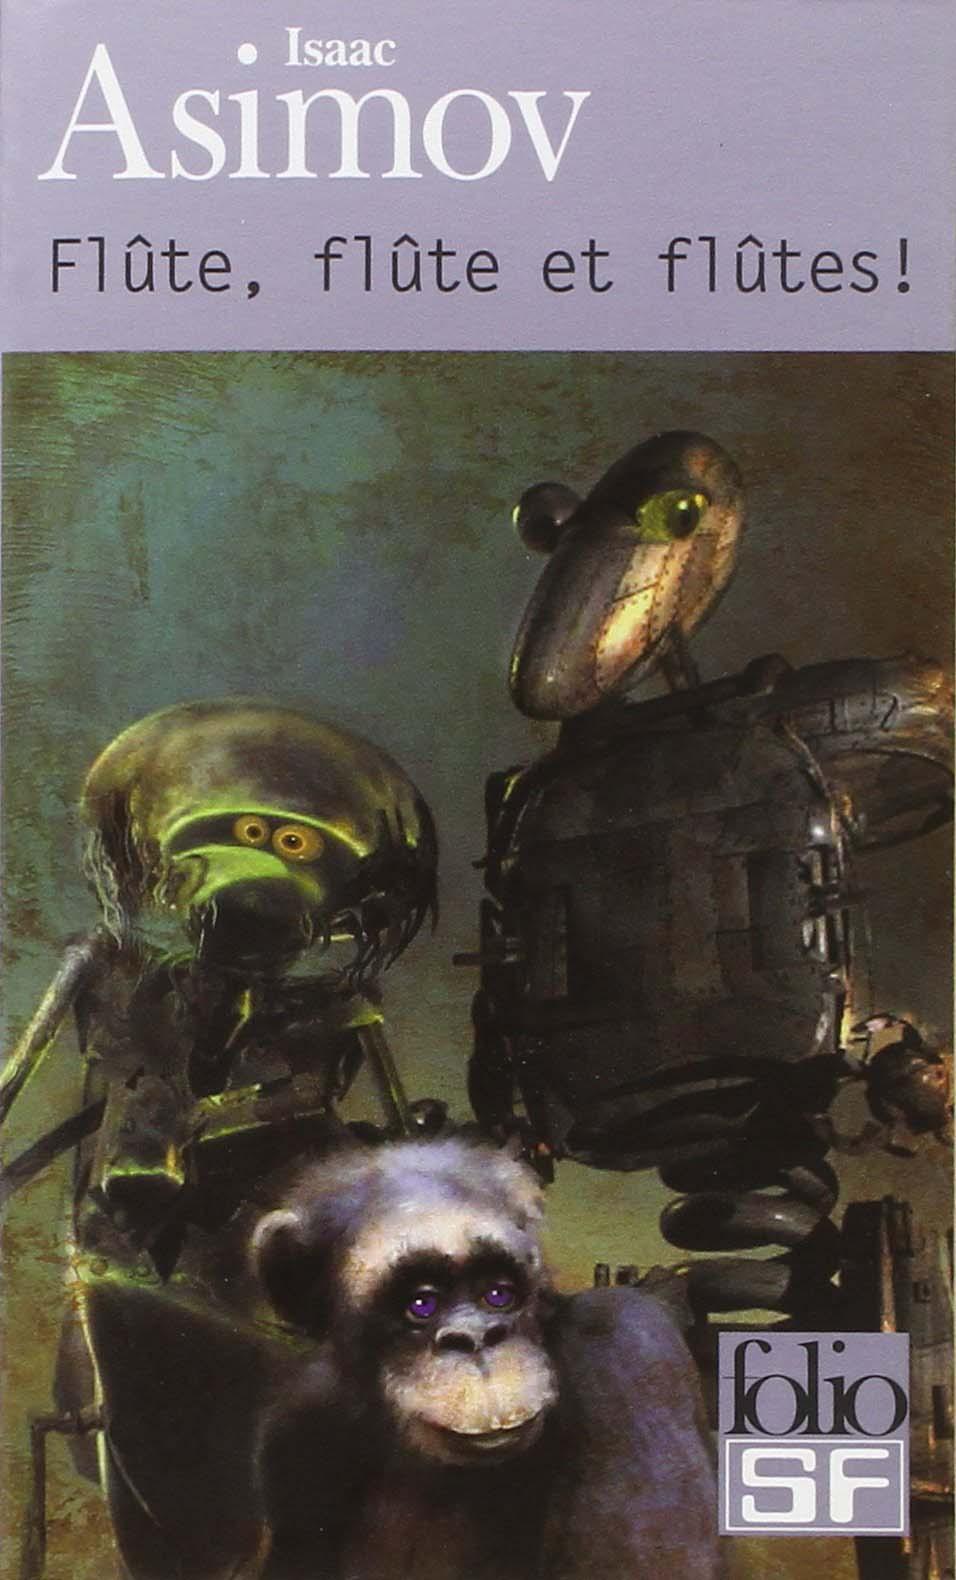 Isaac Asimov, Flute flute et flute